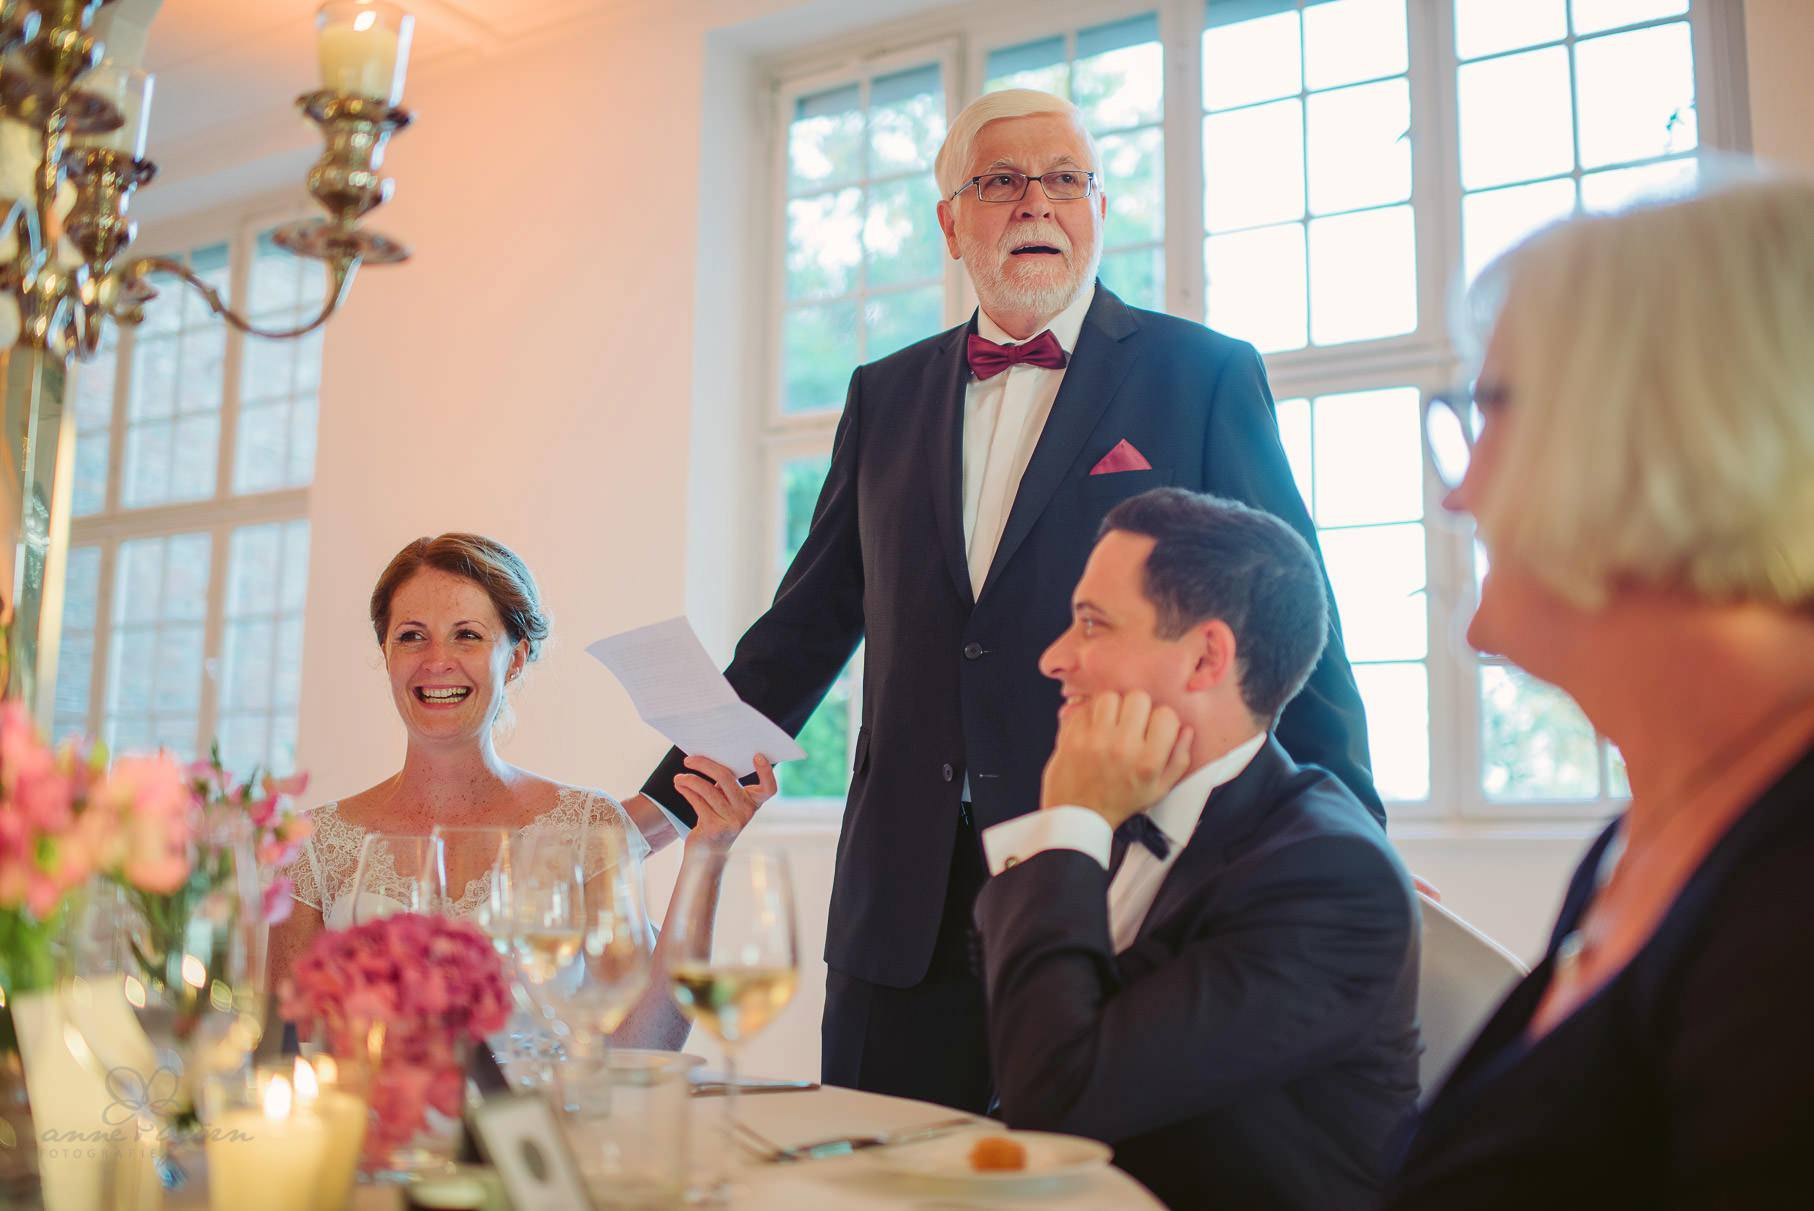 0093 aud blog d75 3088 - Hochzeit an der Hamburger Elbe - Ann-Katrin & Daniel